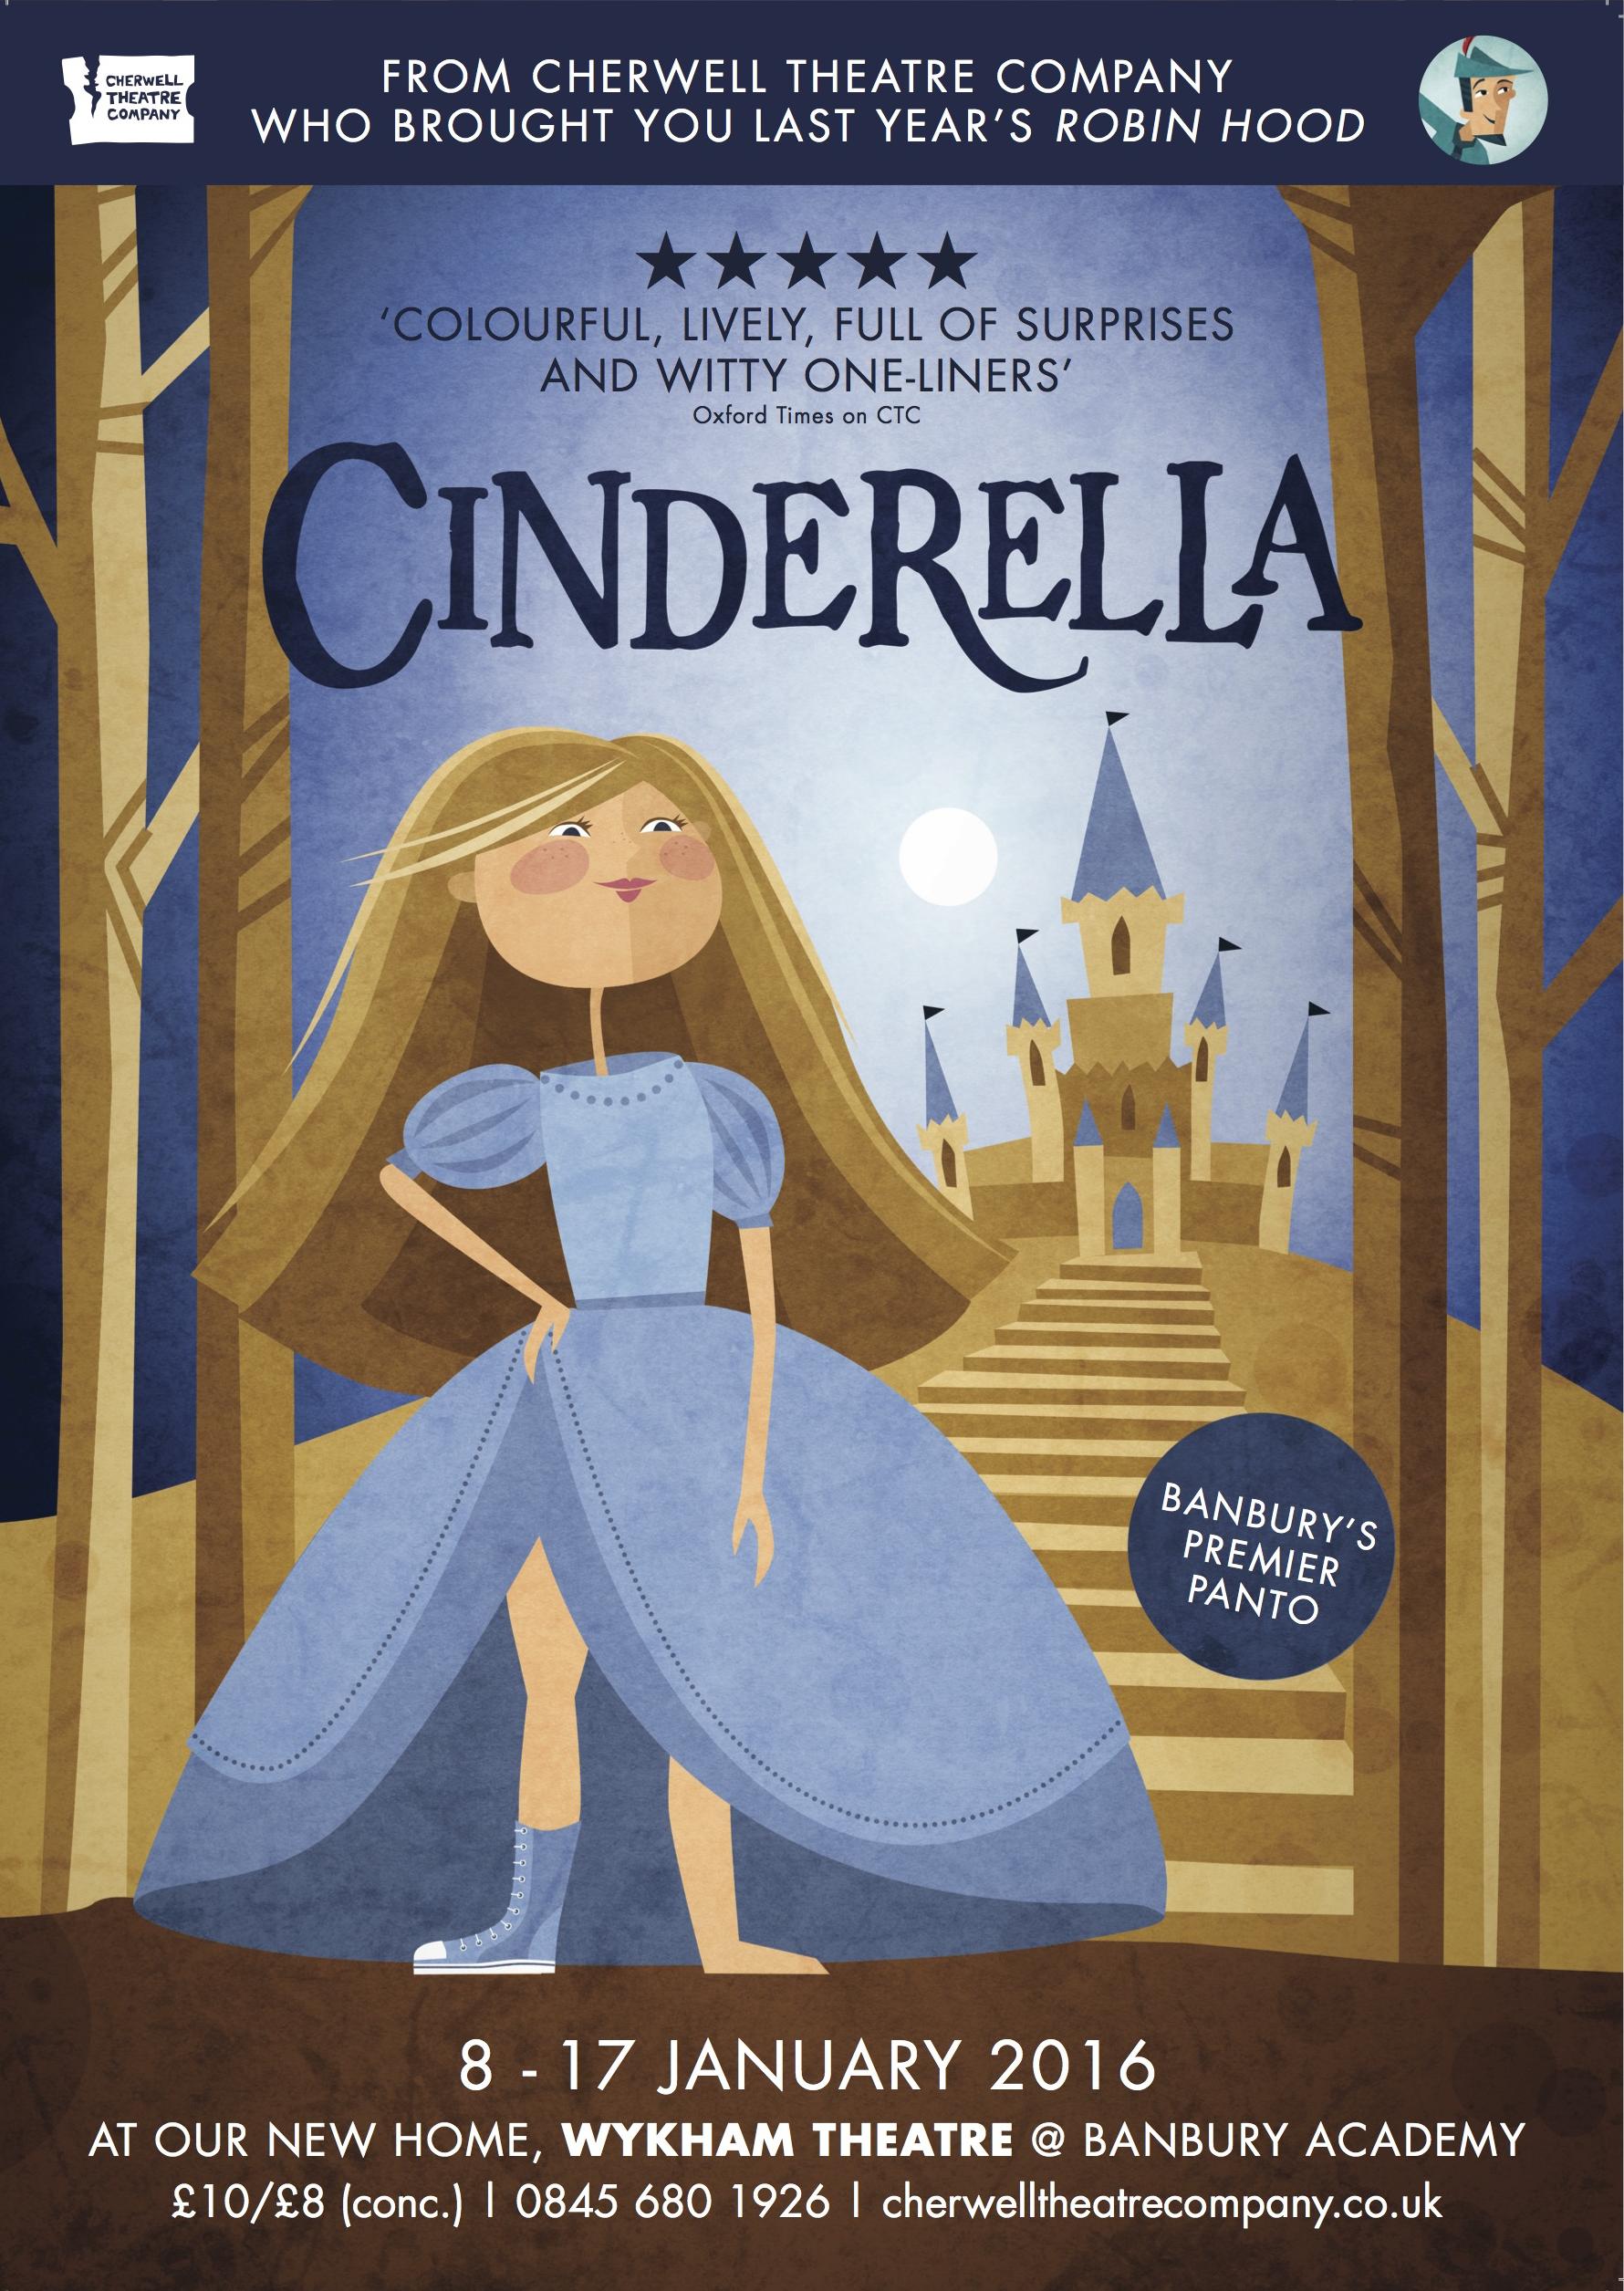 Cinderella cropped.png